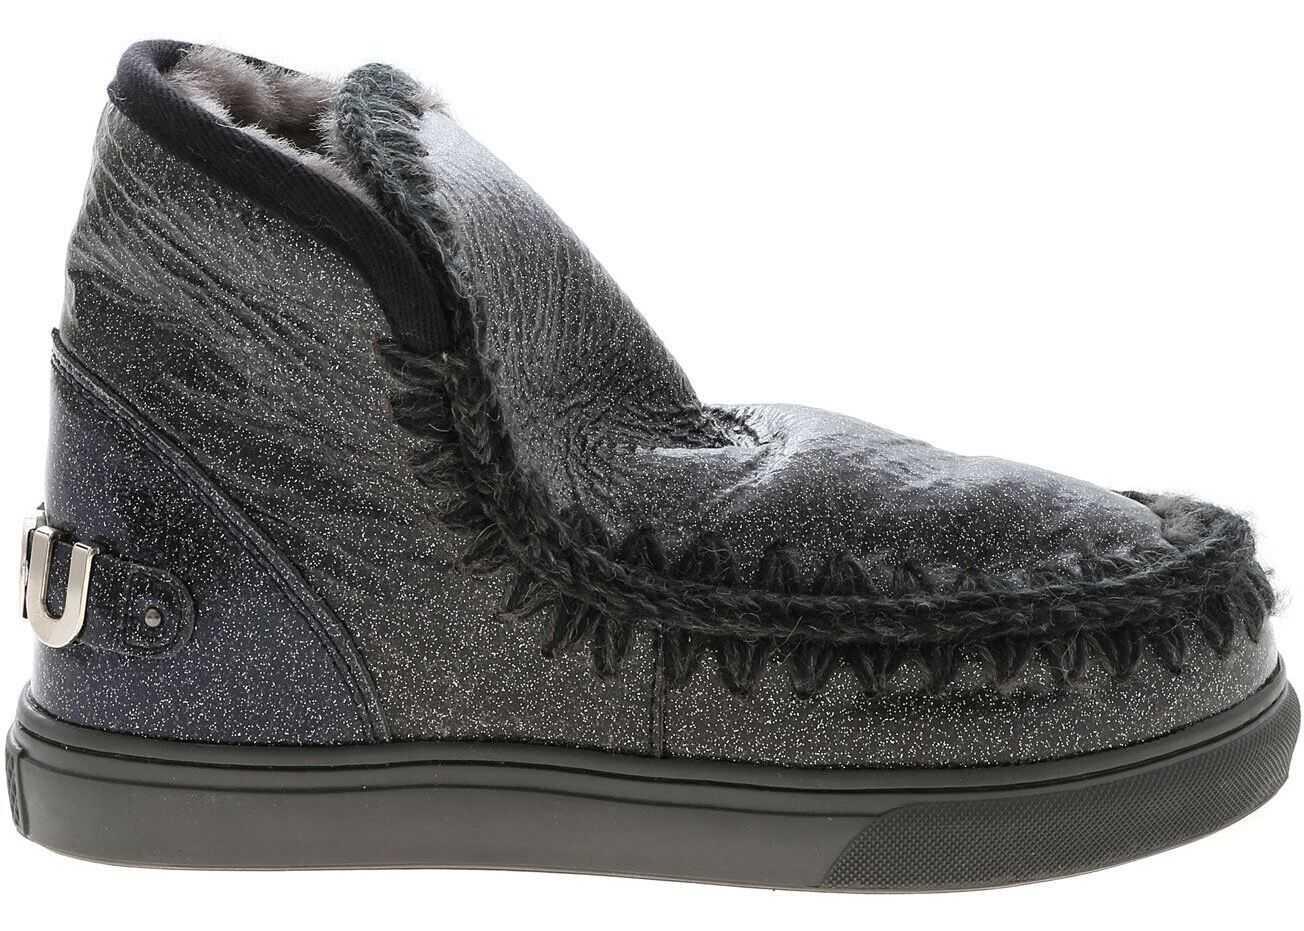 Mou Eskimo Sneakers In Glittery Black MU.FW111008C 3DCHA Grey imagine b-mall.ro